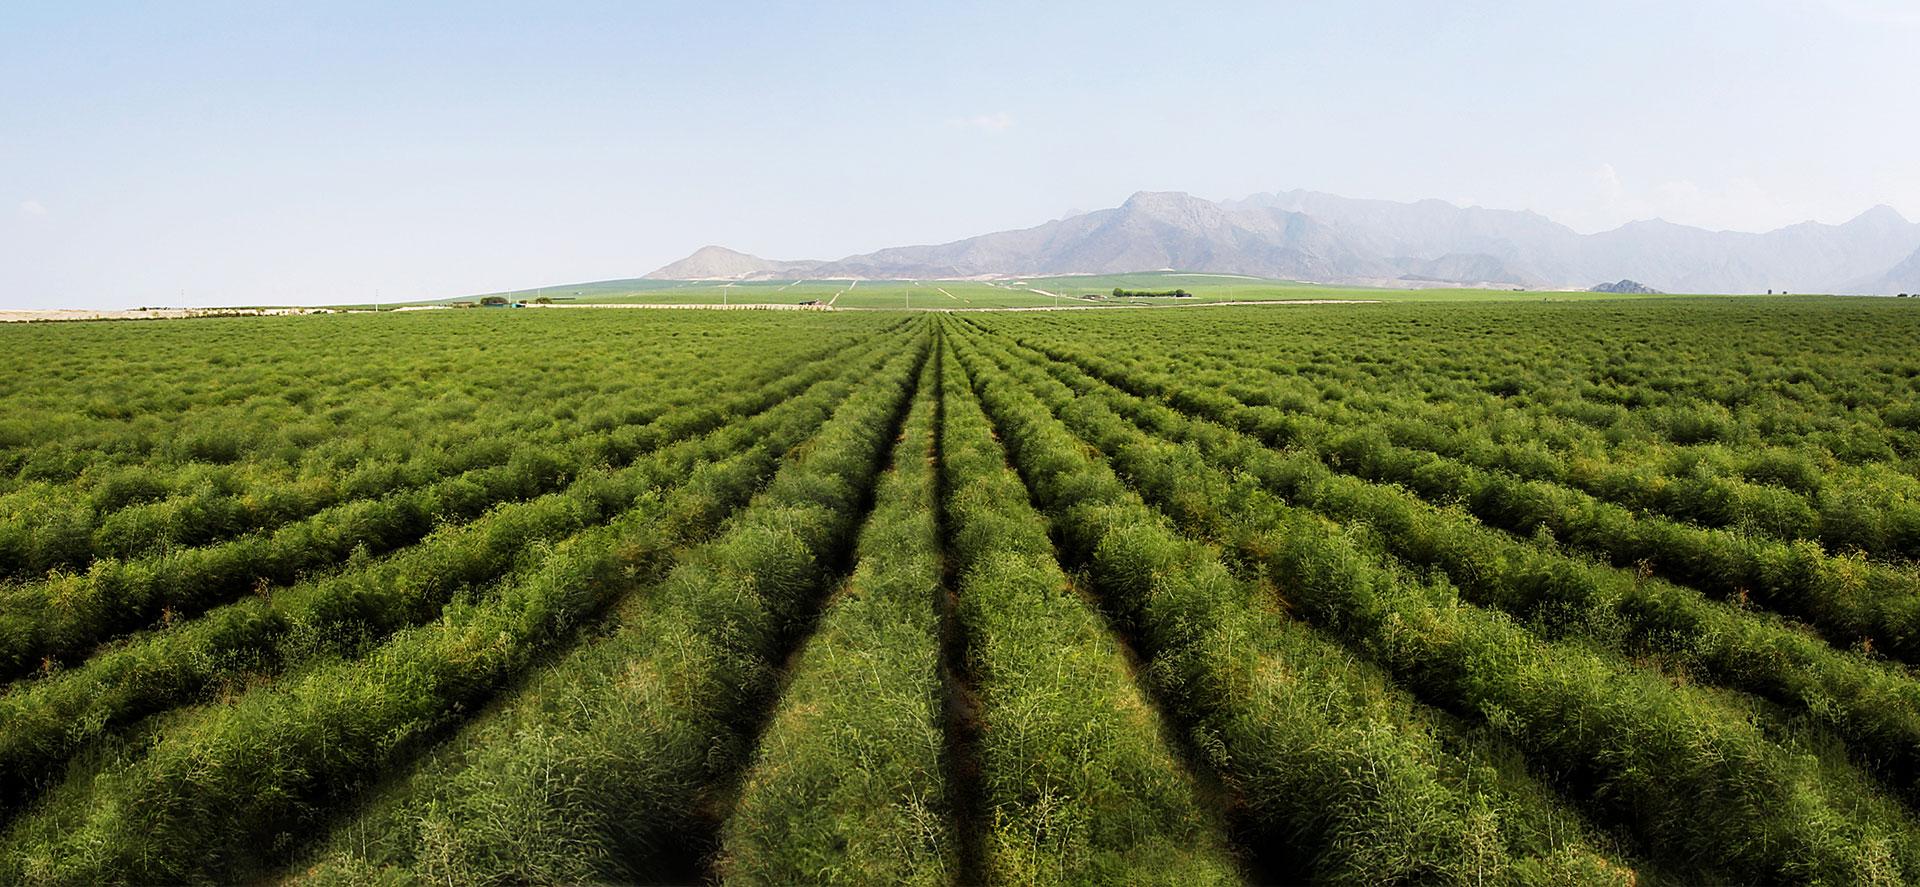 Fields of green asparagus   Virú Naturally ahead